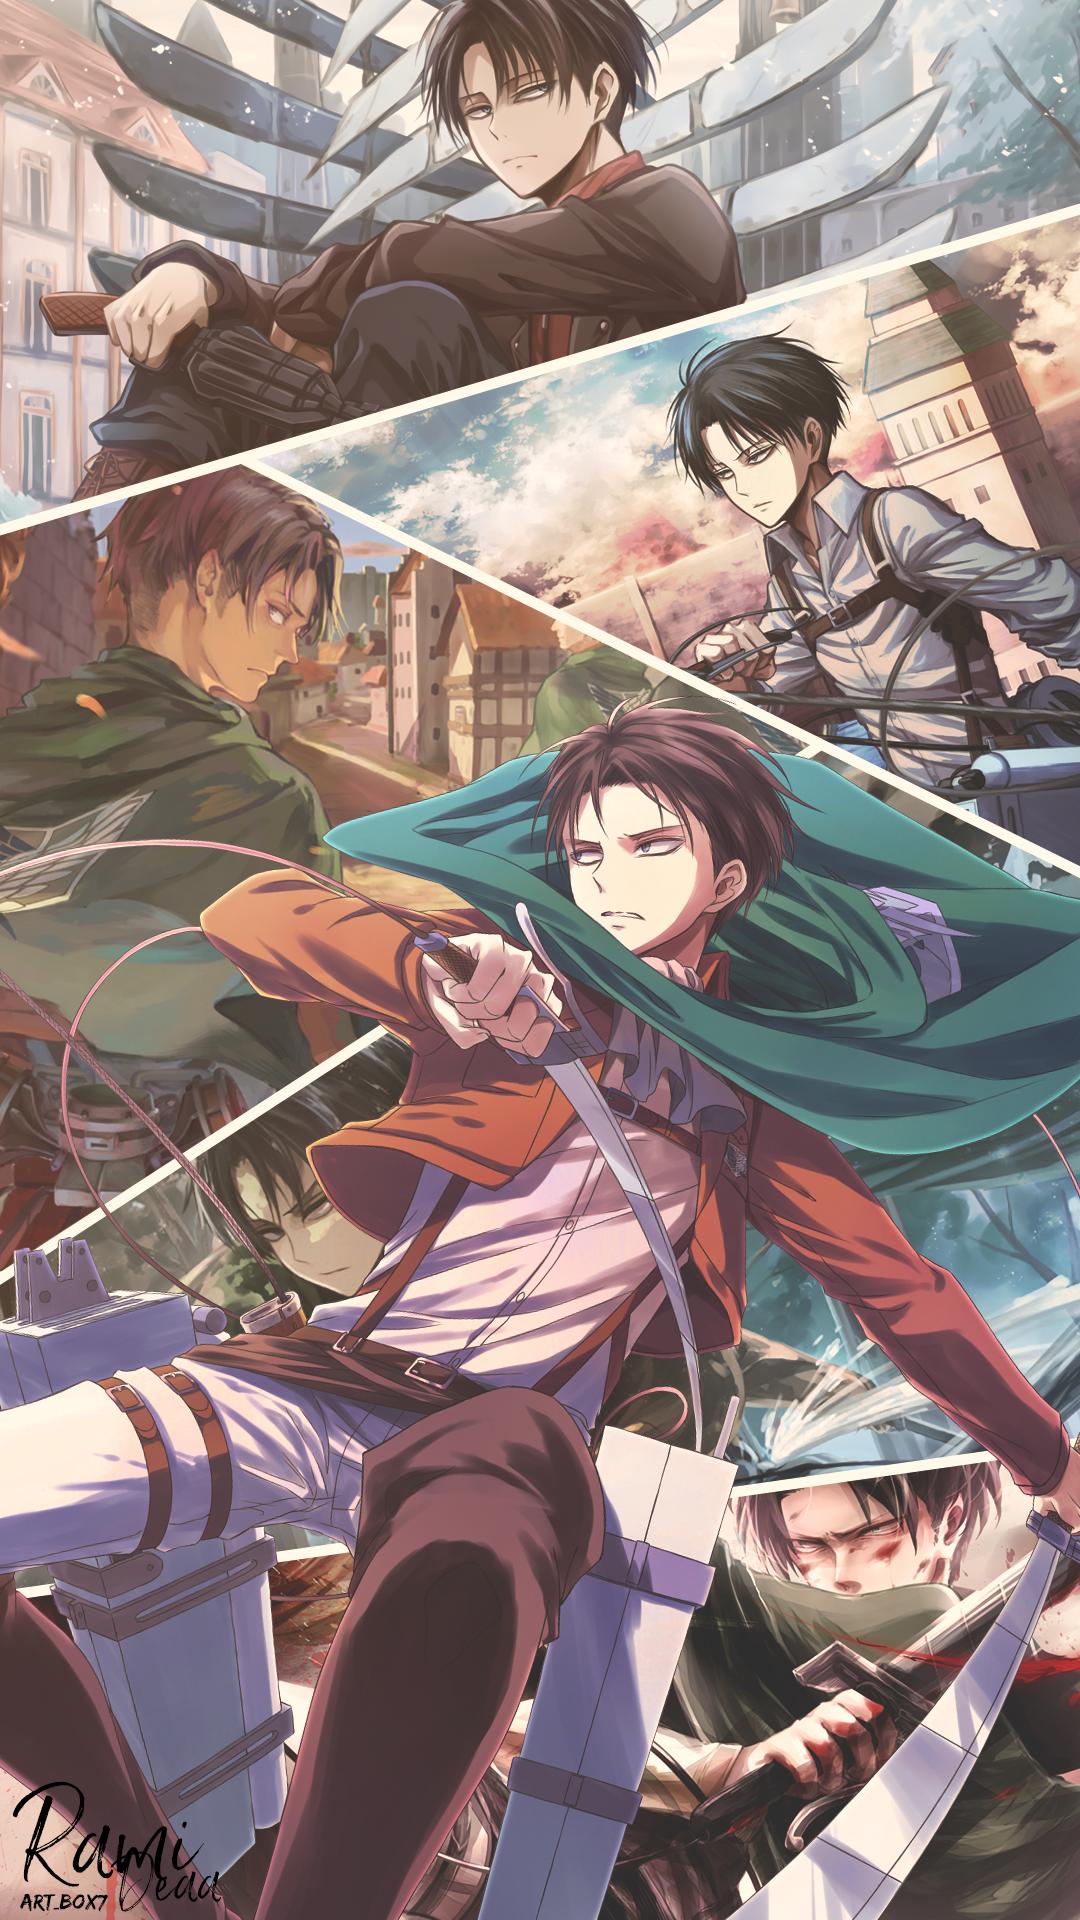 Pin By Wacky Artistry On Attack On Titan Attack On Titan Levi Attack On Titan Anime Attack On Titan Season